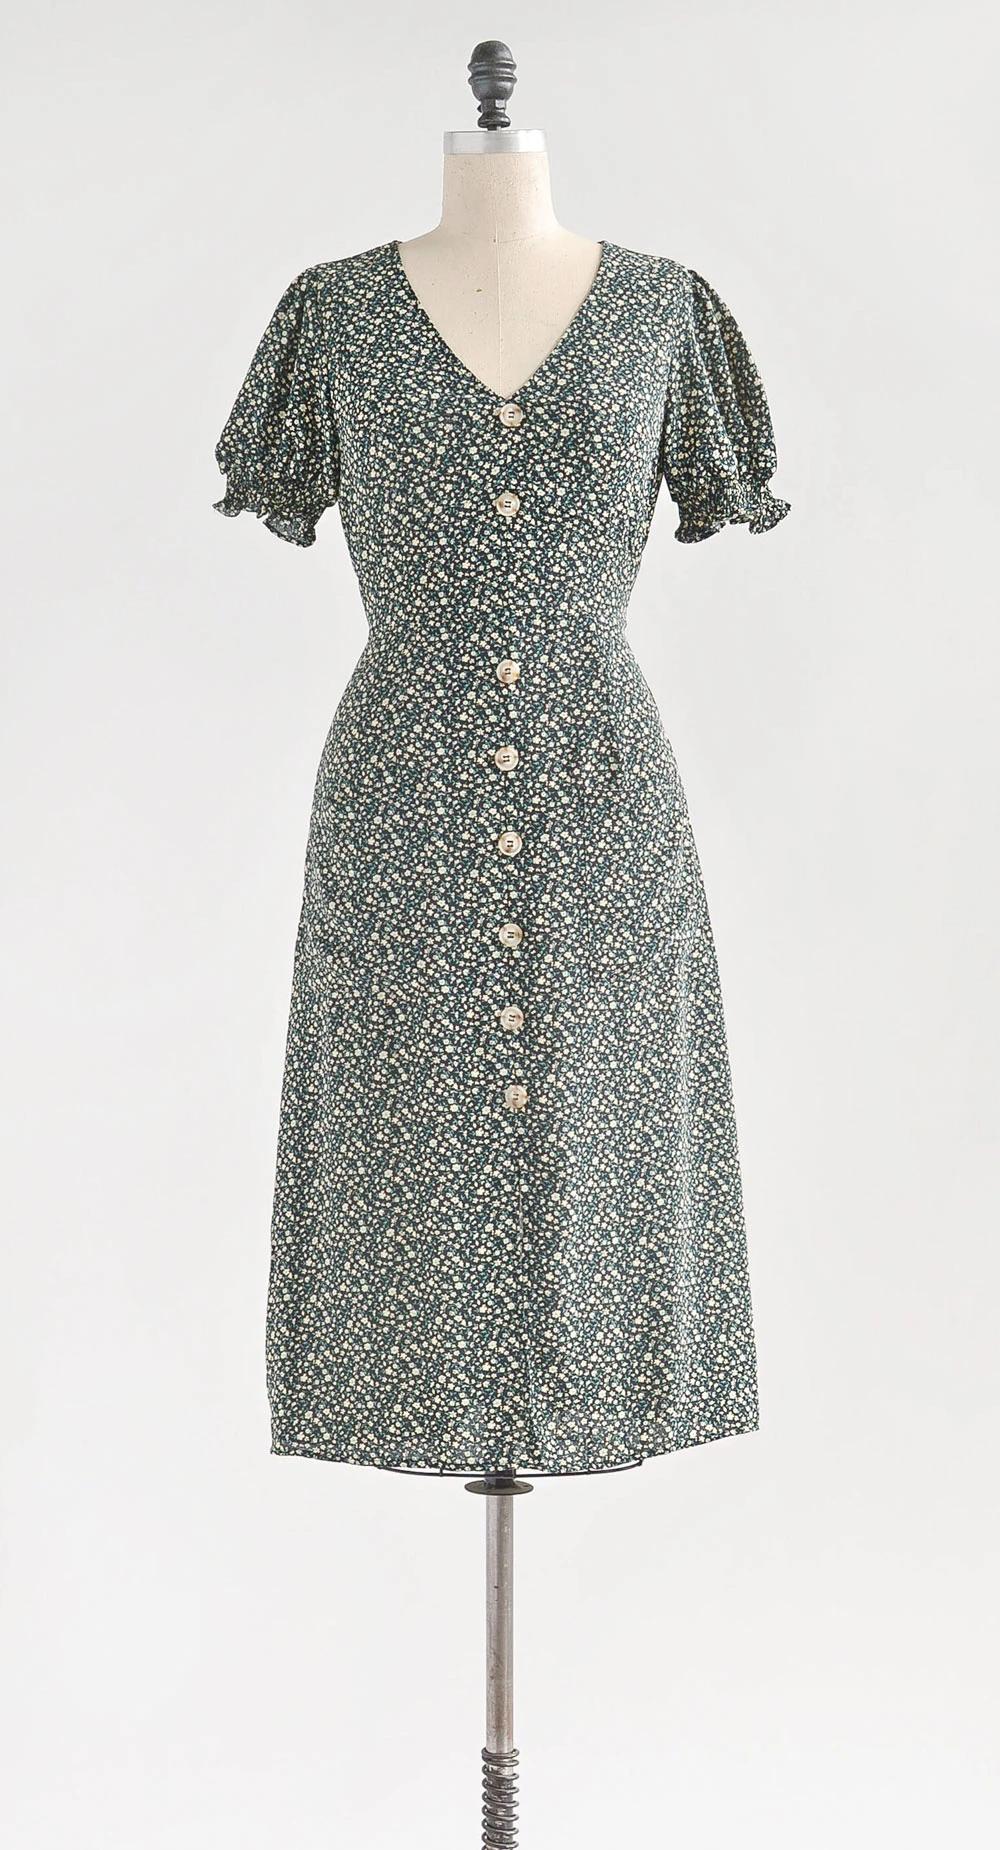 Affordable Feminine Floral Midi Dress Vintage Style Dresses Casual Dresses 20s Fashion Dresses [ 1850 x 1000 Pixel ]